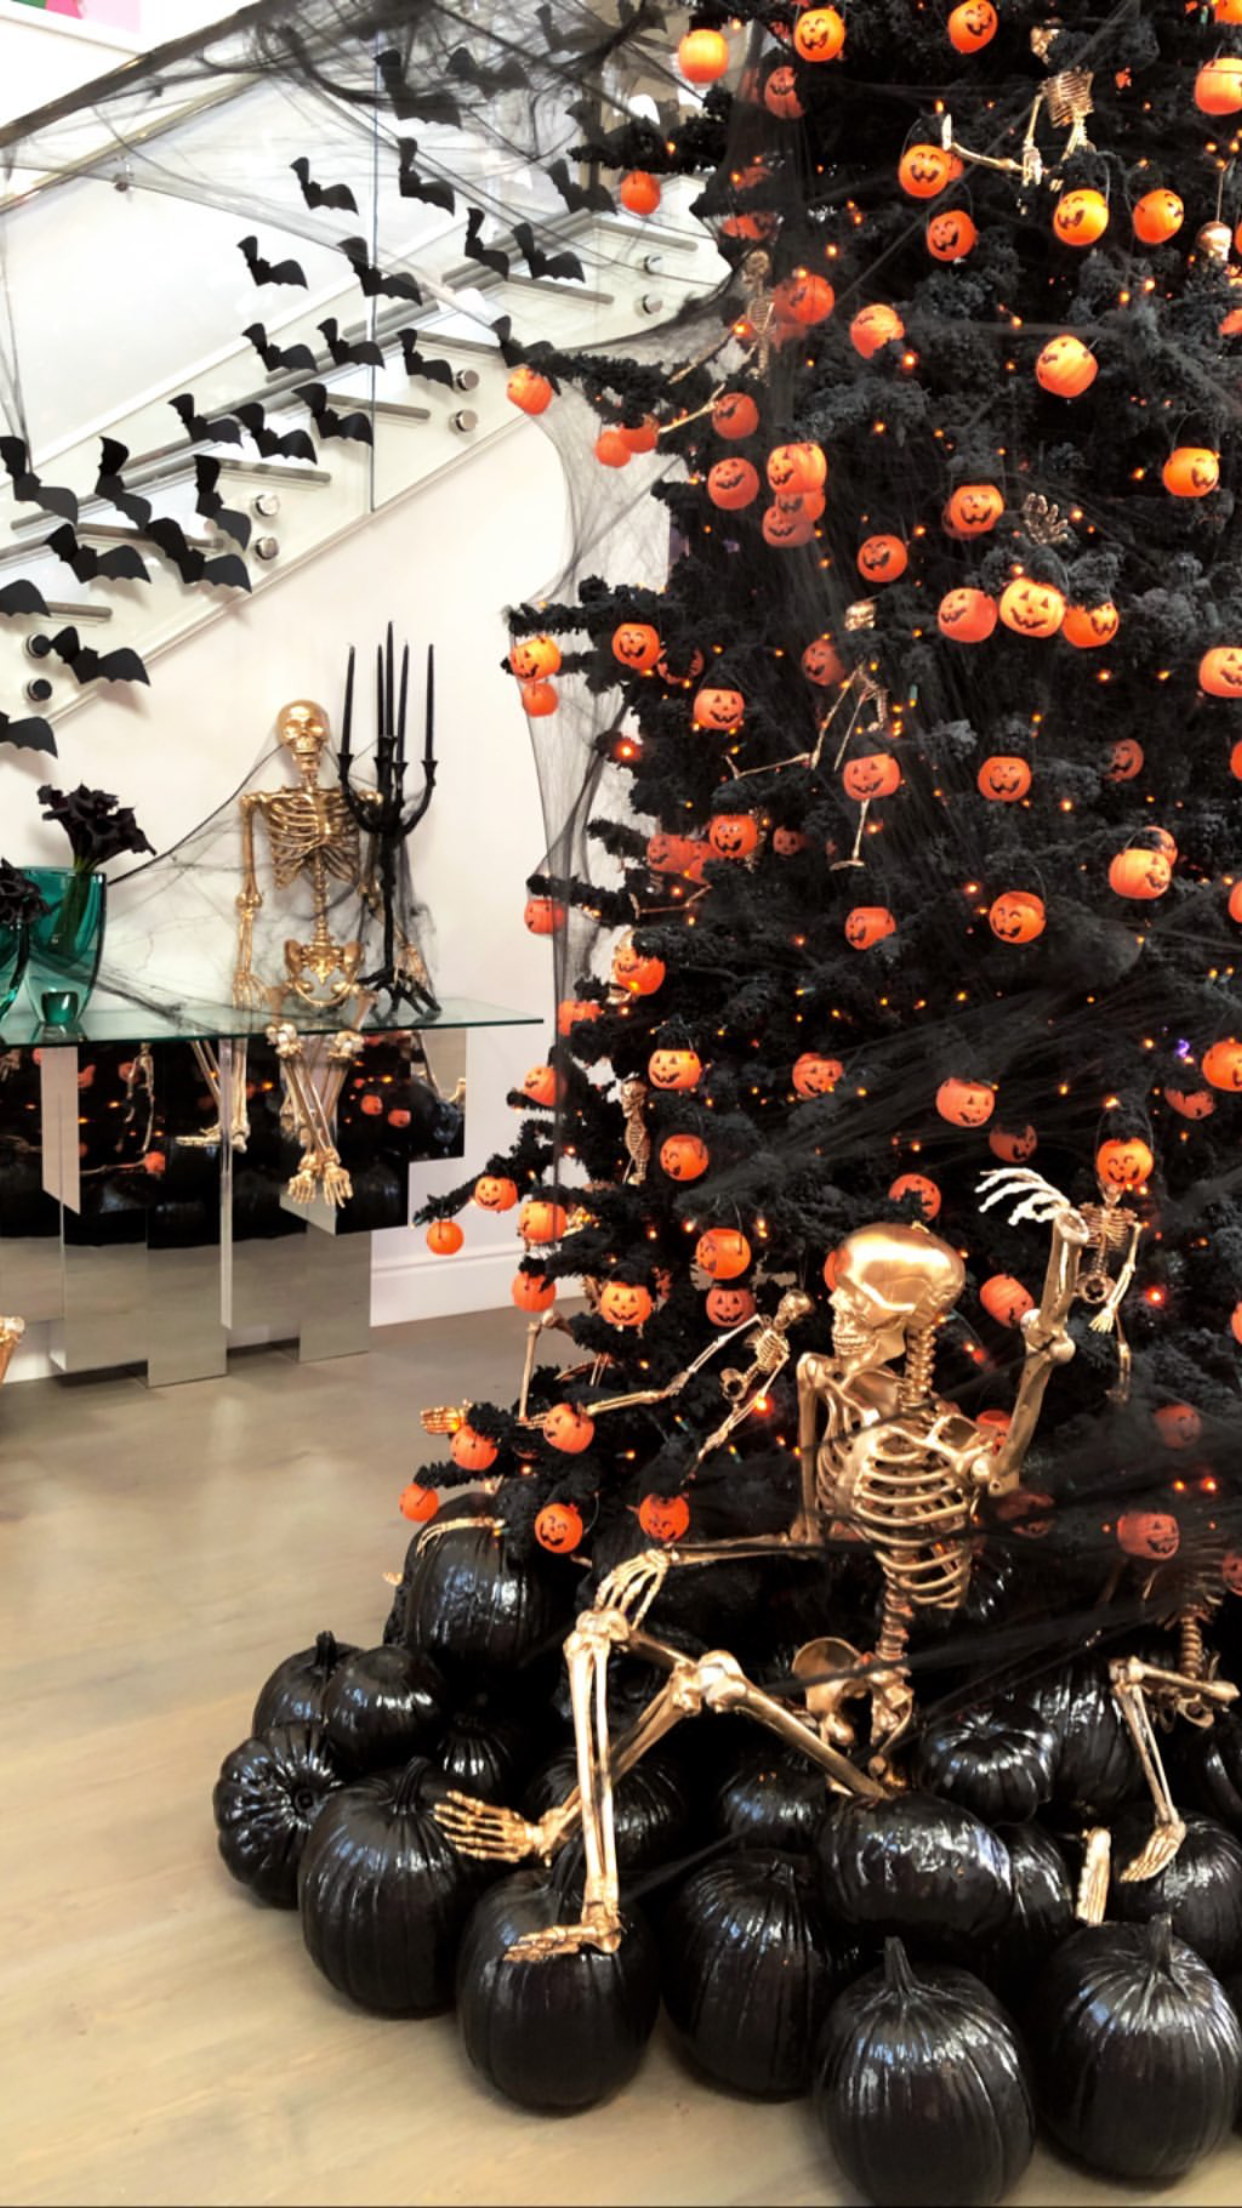 Kylie Jenner Halloween 2020 Black Halloween tree with orange pumpkins Kylie Jenner home in